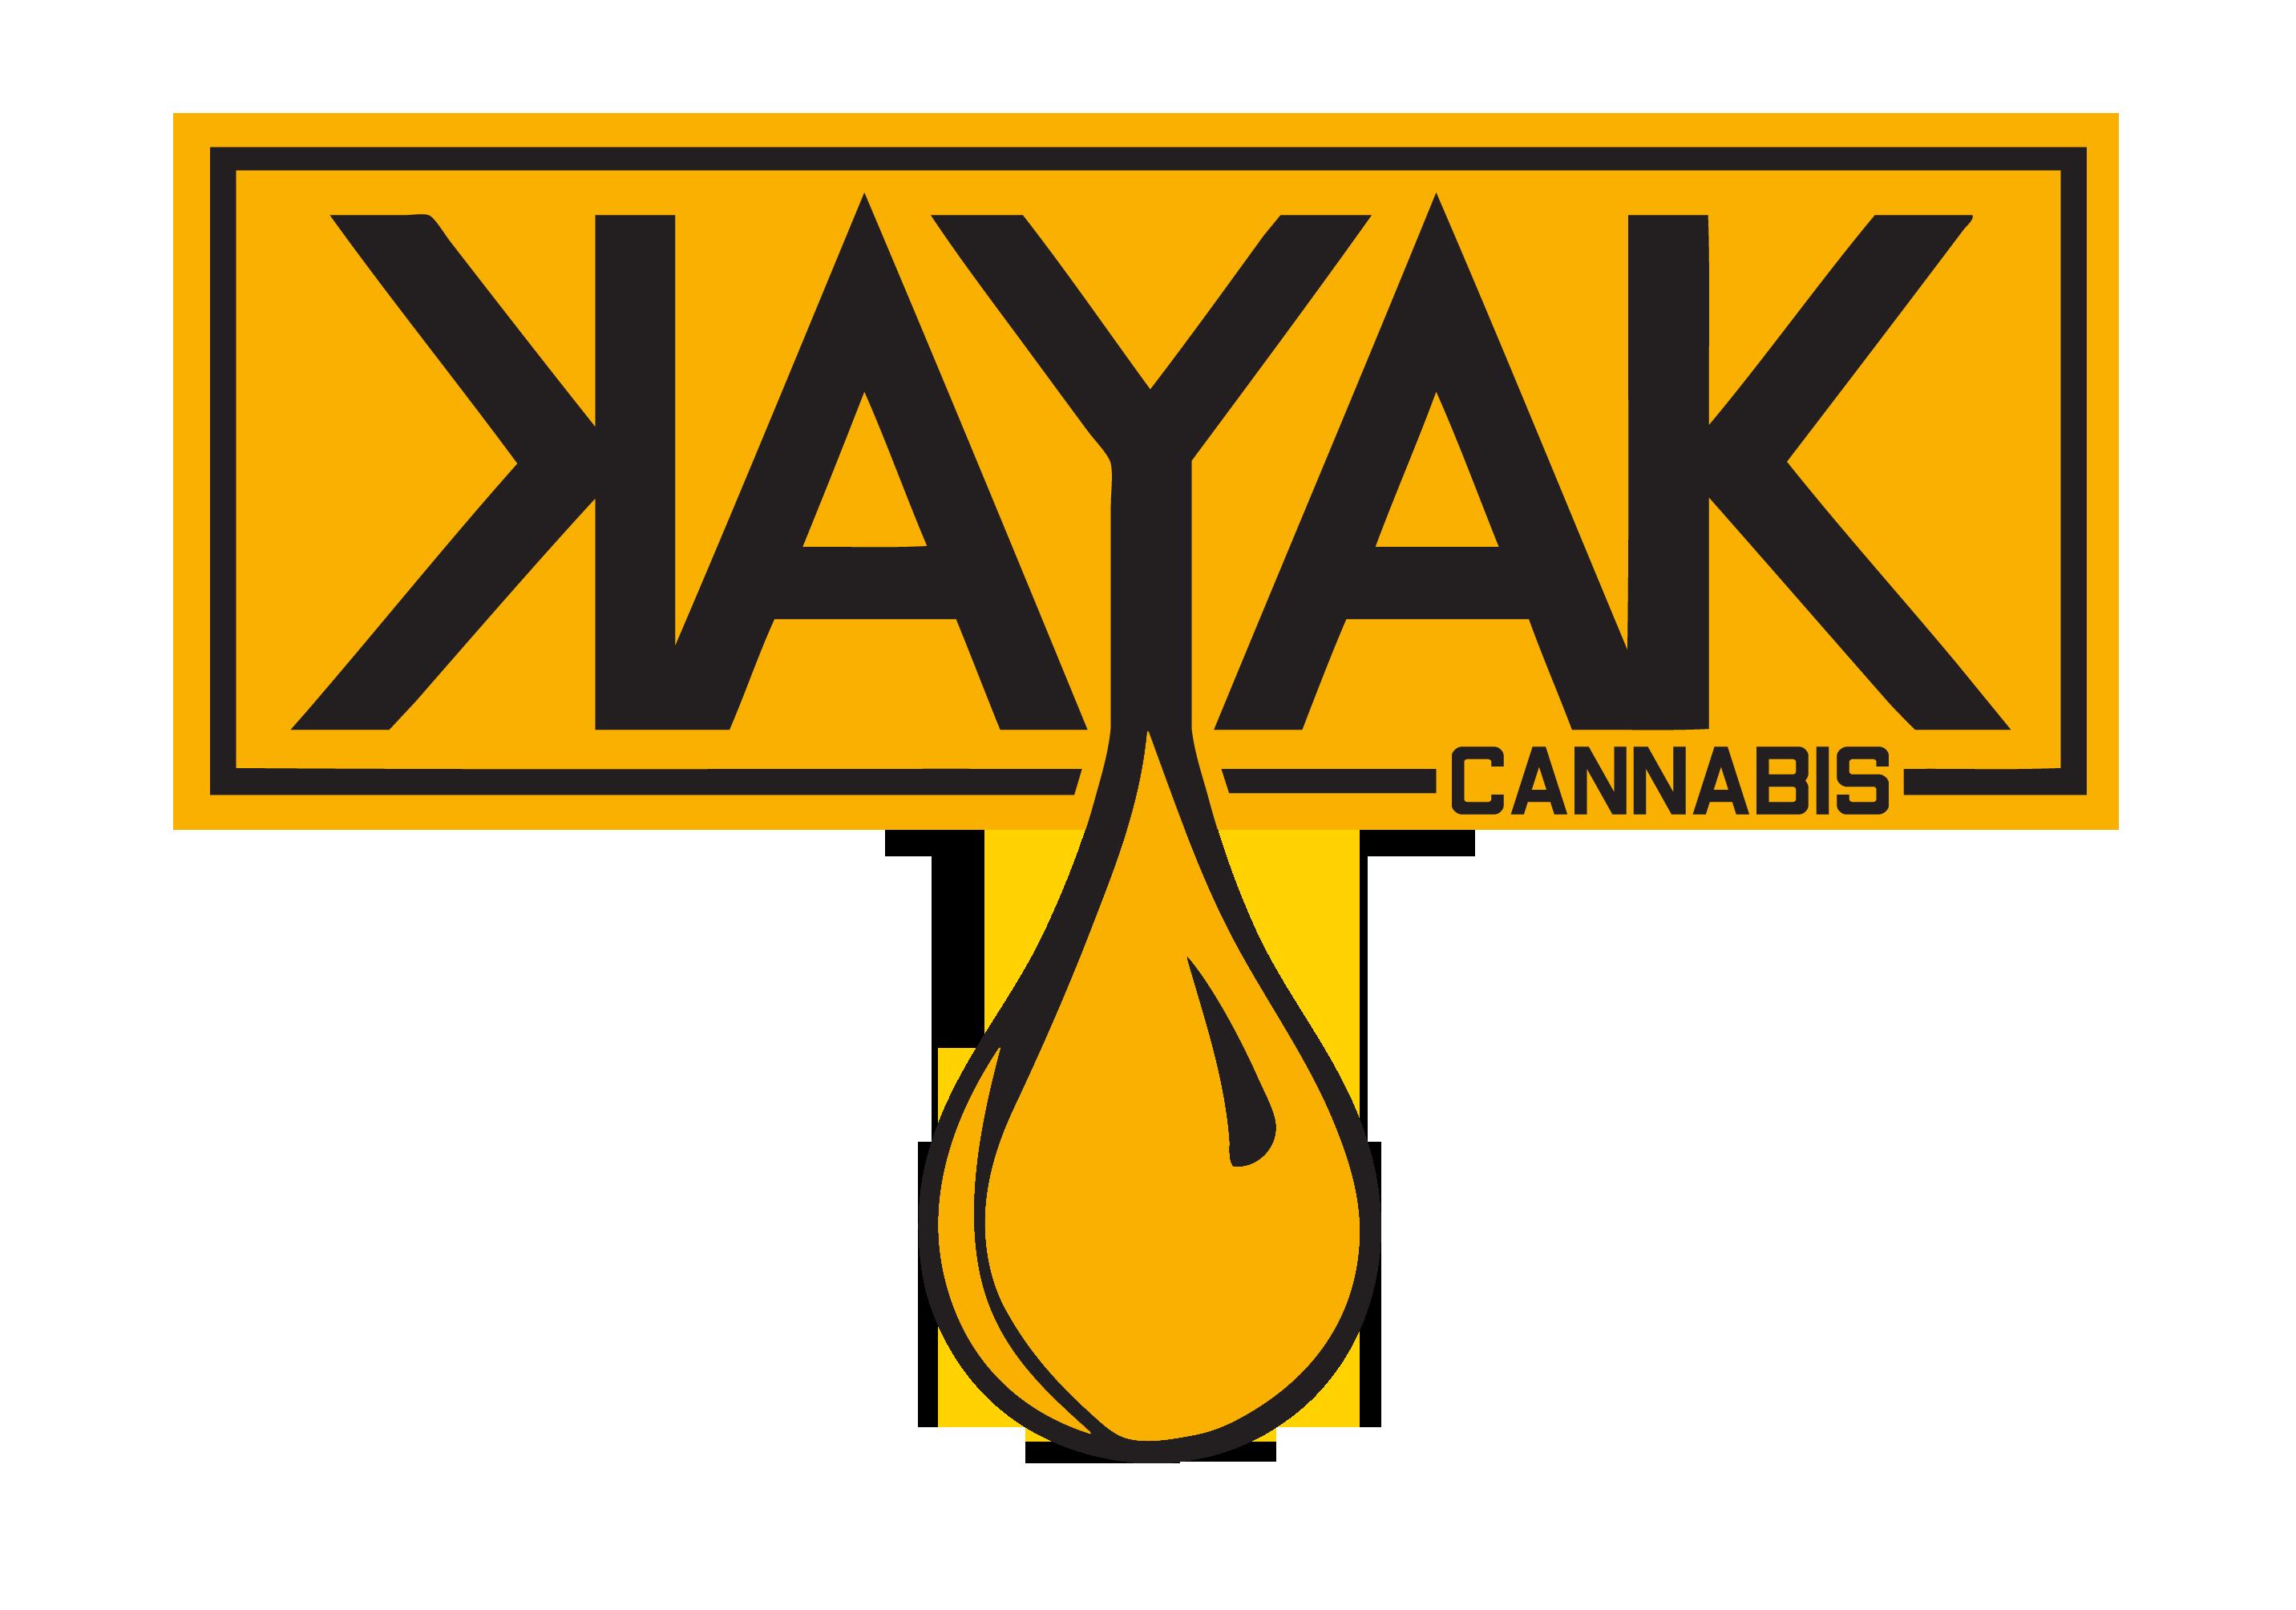 Kayak Cannabis